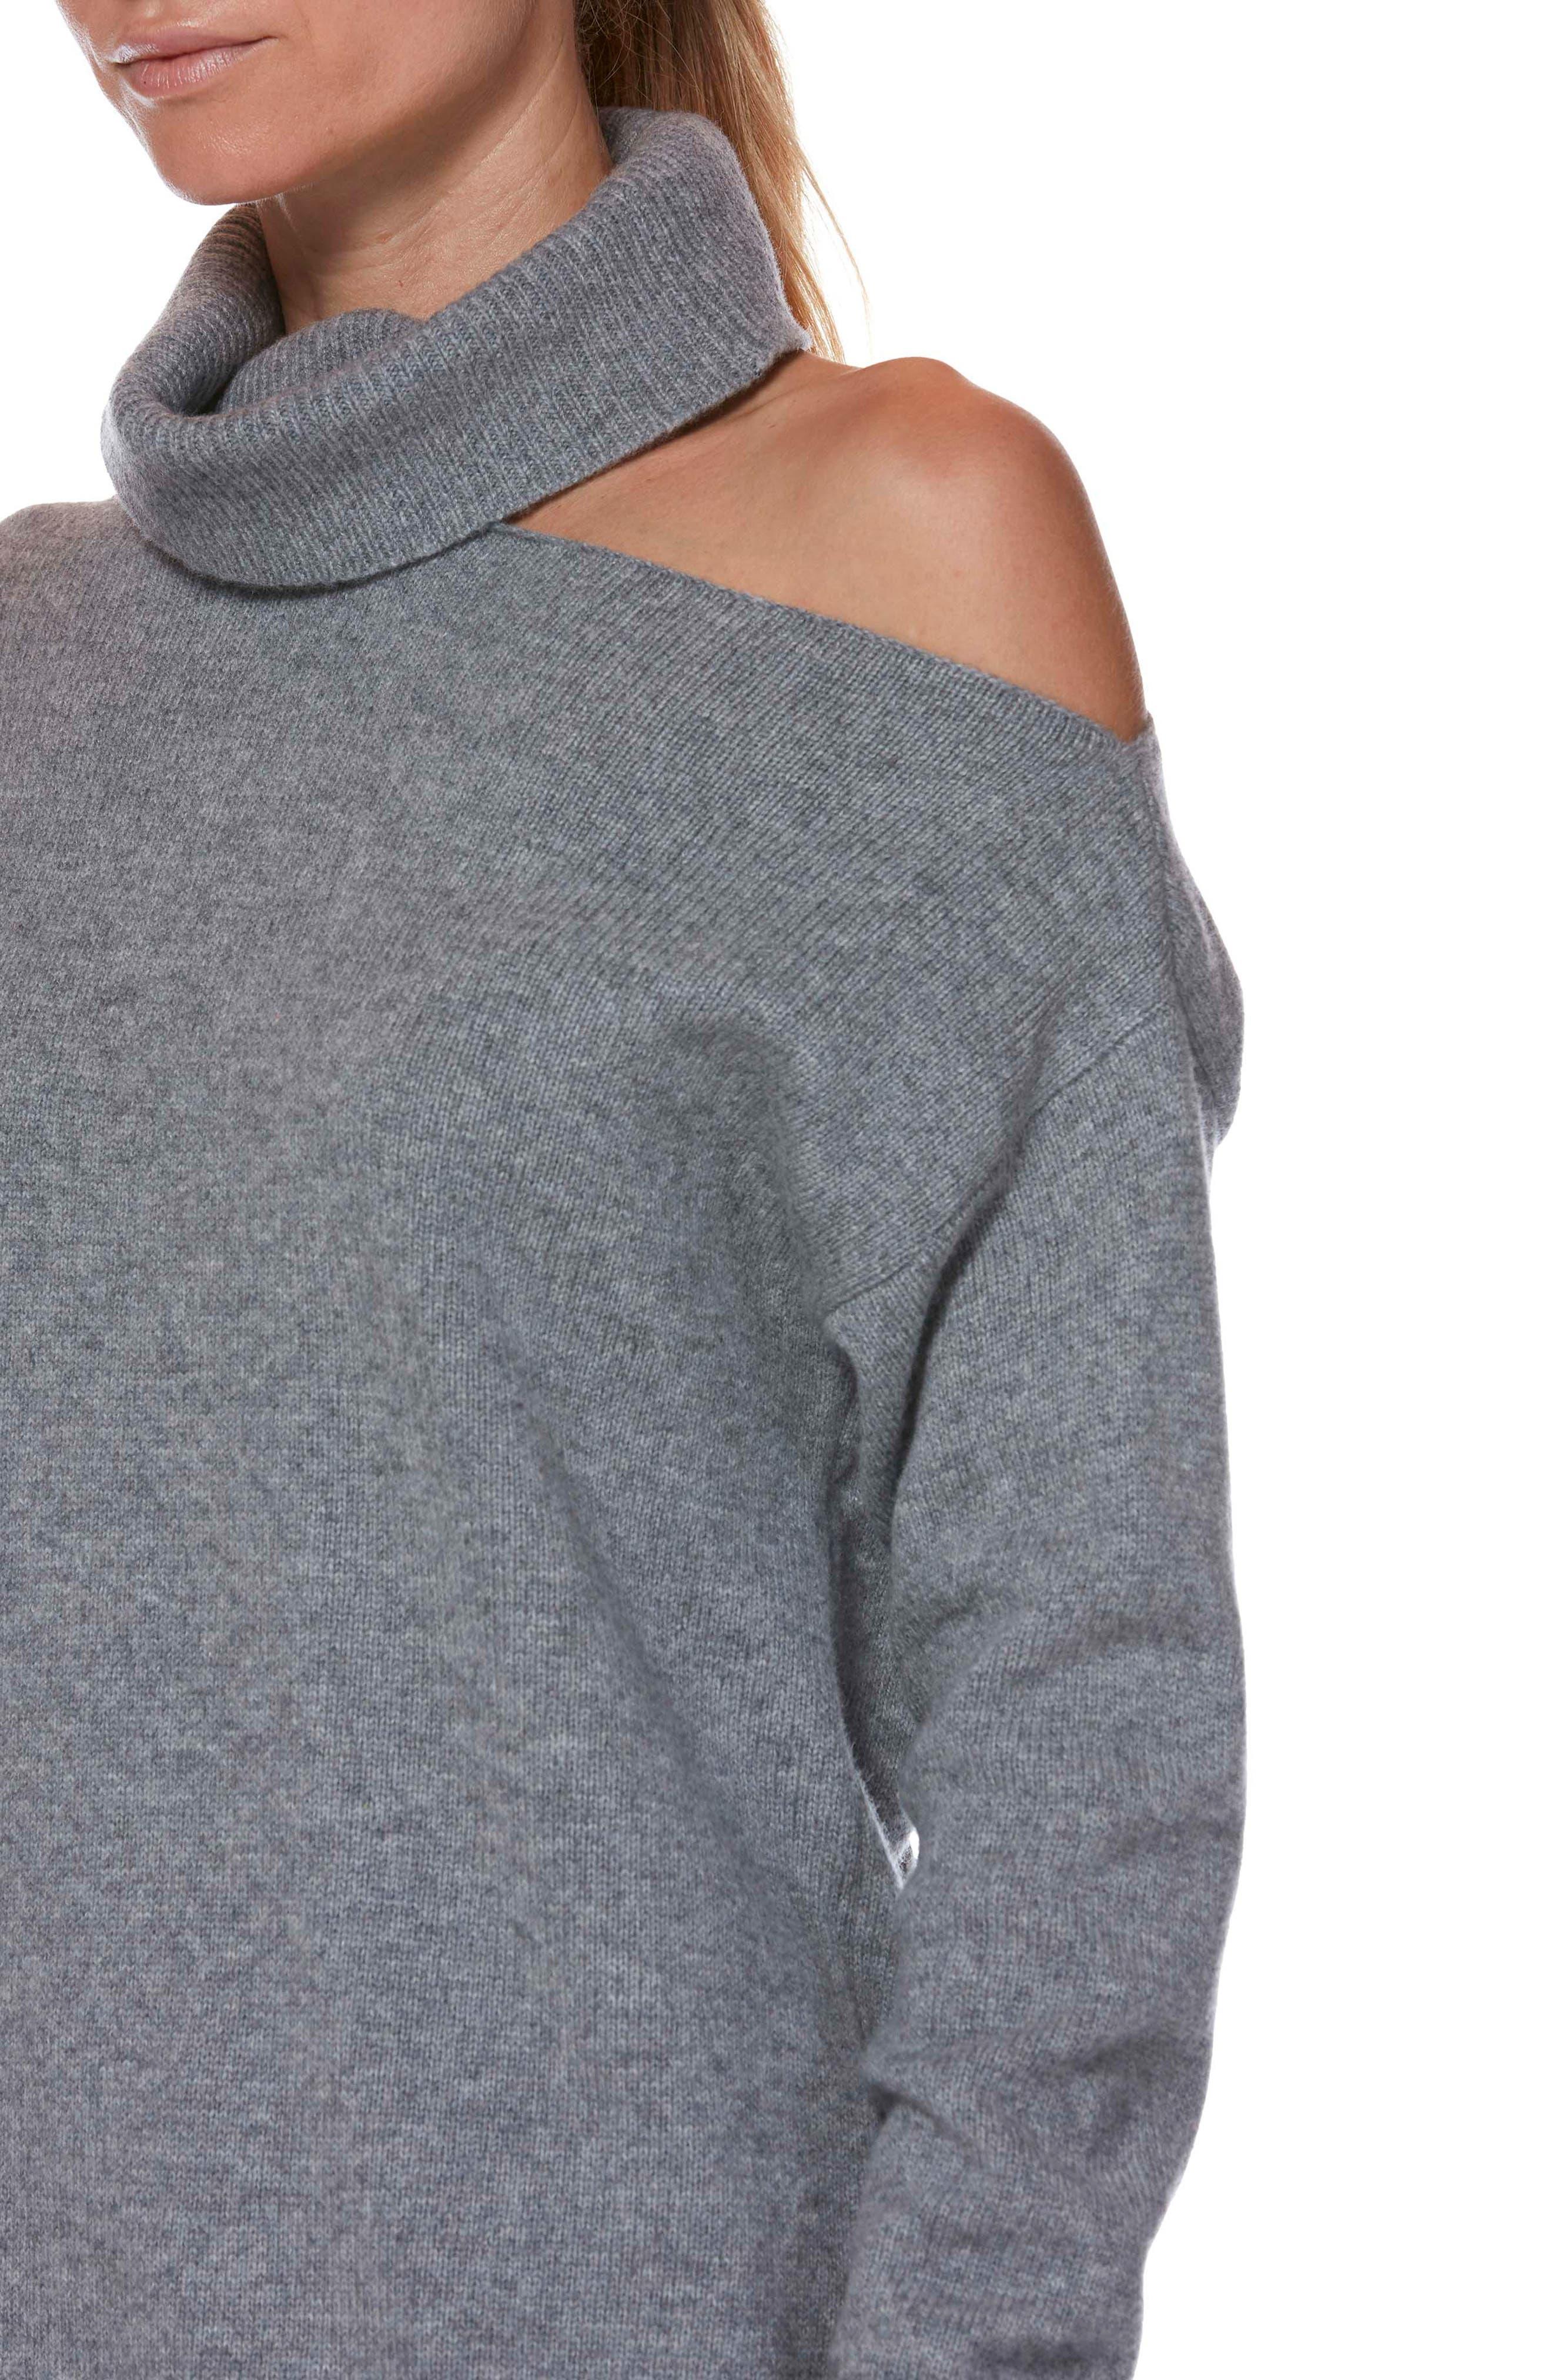 Raundi Cutout Shoulder Sweater,                             Alternate thumbnail 3, color,                             HEATHER GREY